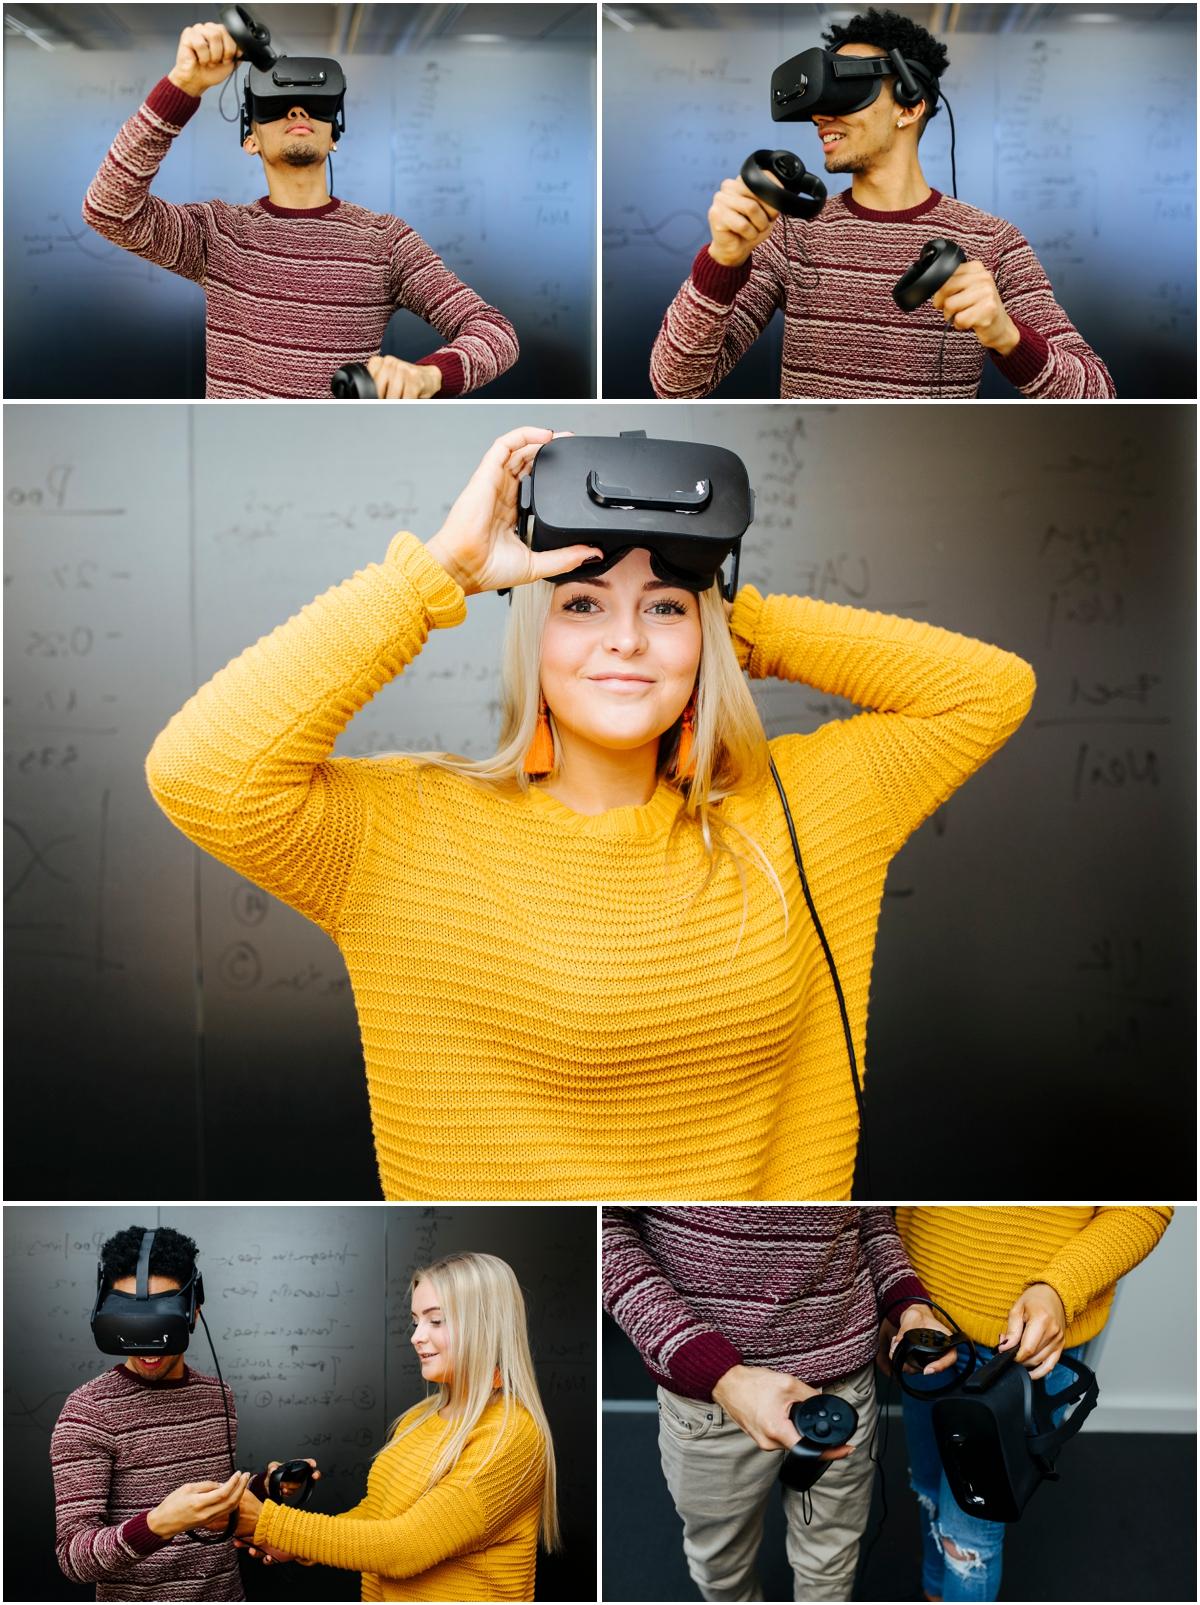 360You-photography-foretagsfotograf-foretagsportratt-stockholm-vallentuna-taby-bildbank-nackademin-7.jpg